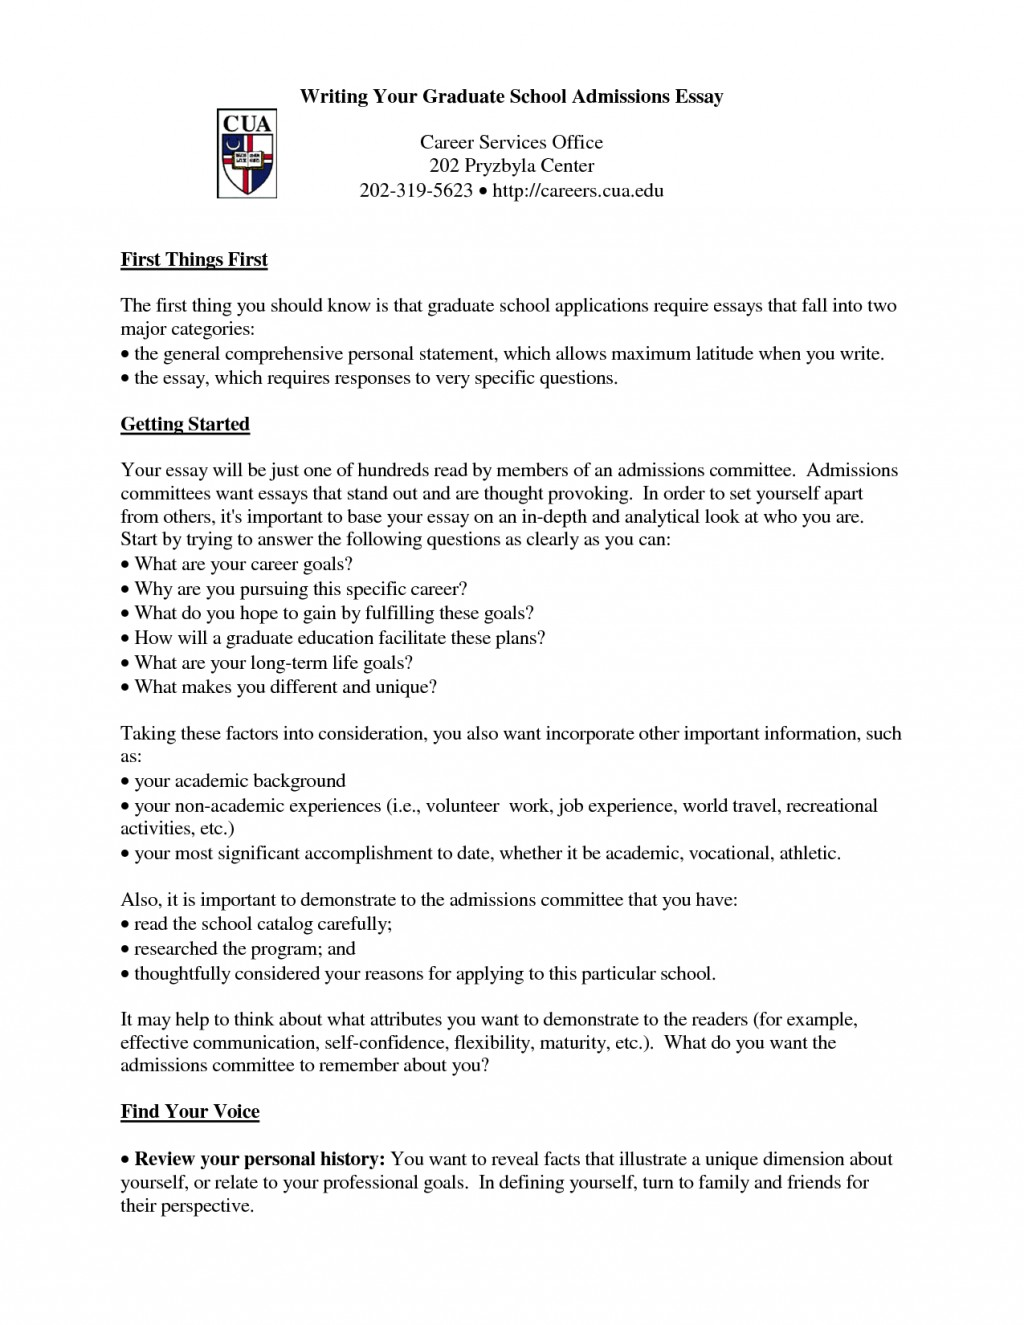 001 Graduate School Admission Essay Essaymedicalpersonalstatement615b0bd1 Frightening Social Work Format Large